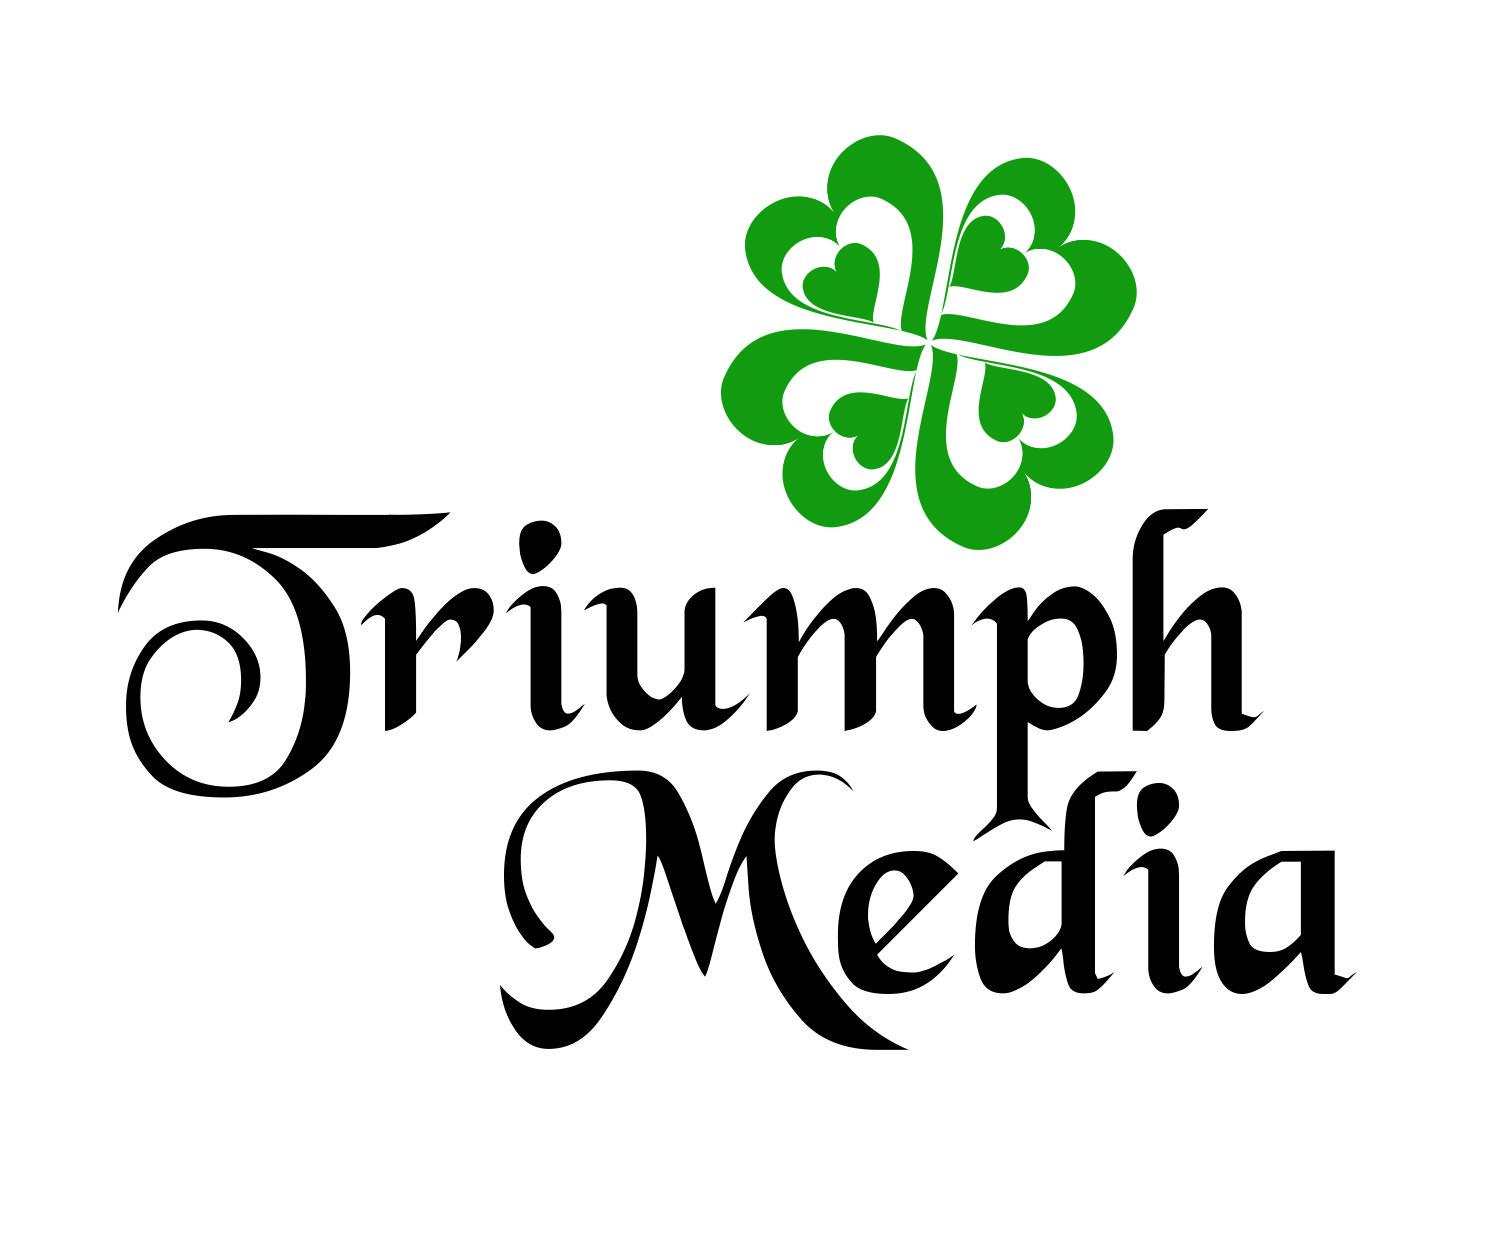 Разработка логотипа  TRIUMPH MEDIA с изображением клевера фото f_5074754ceebf8.jpg